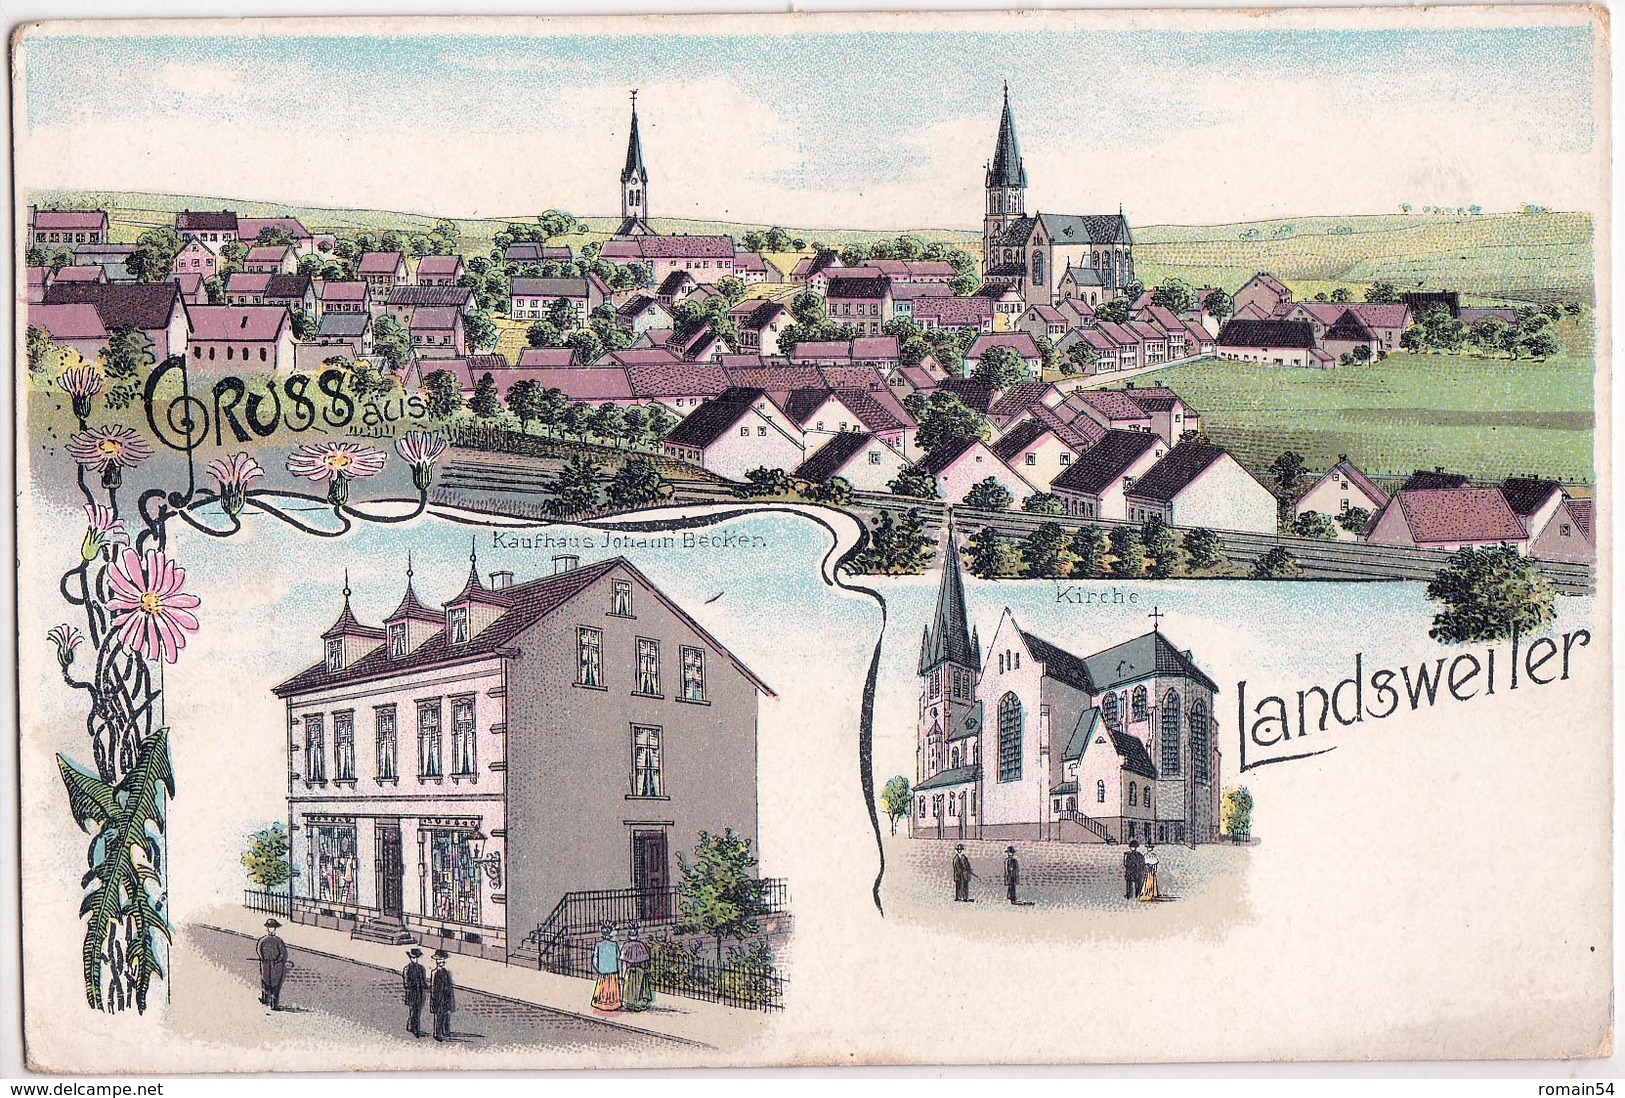 LANDSWEILER-LITHO A 3 VUES - Allemagne